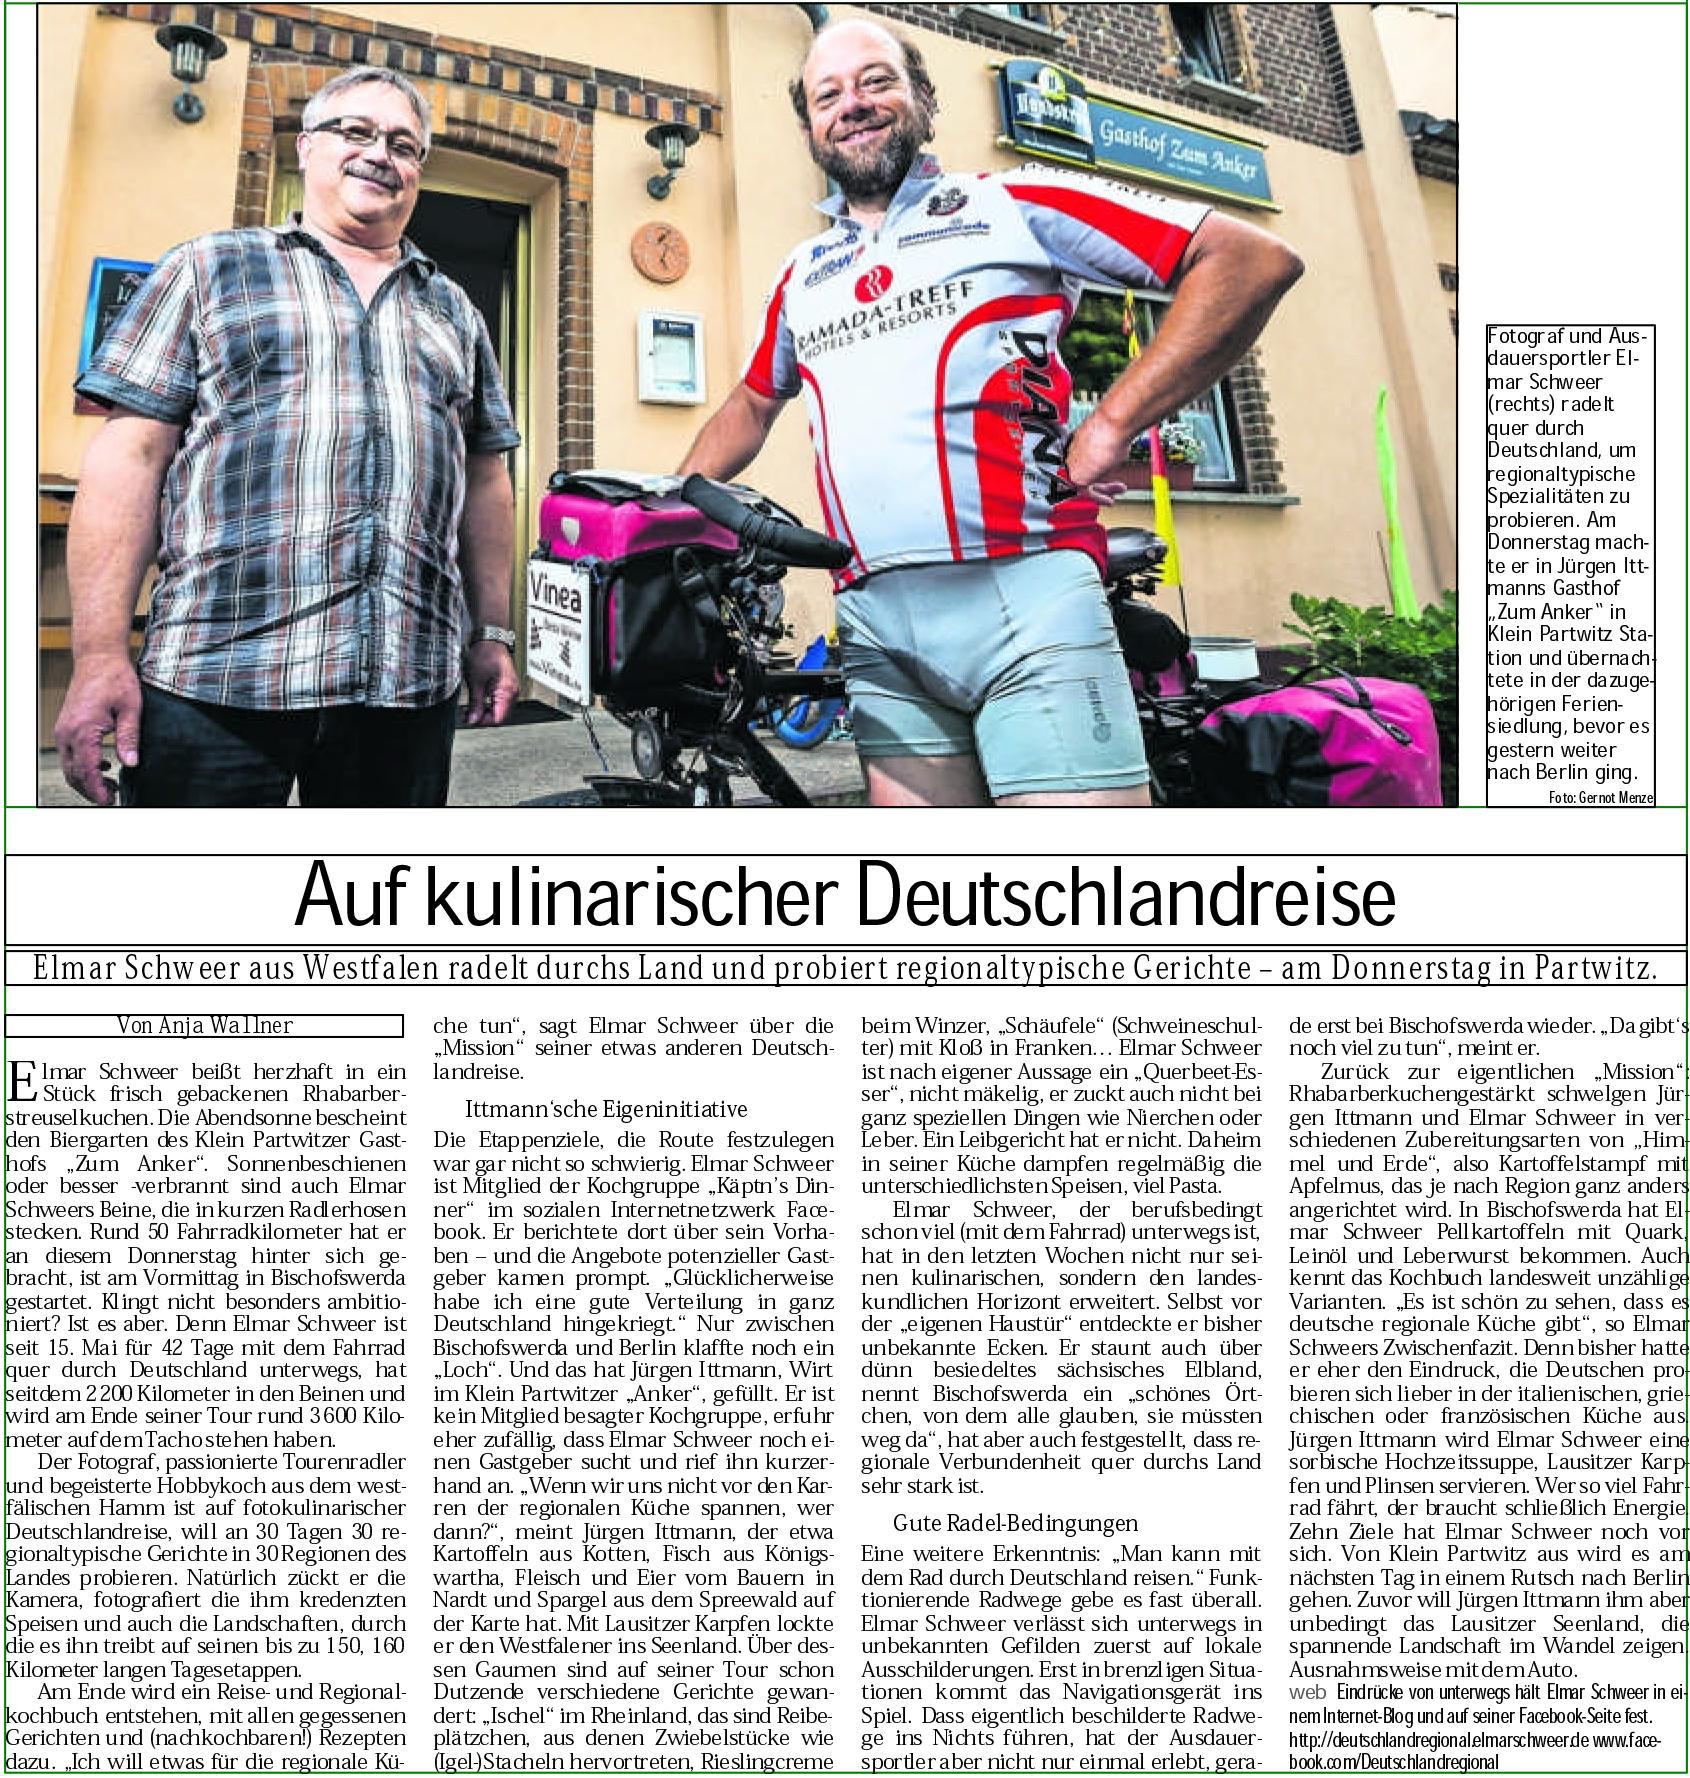 Print_Artikel_13hoyradler_